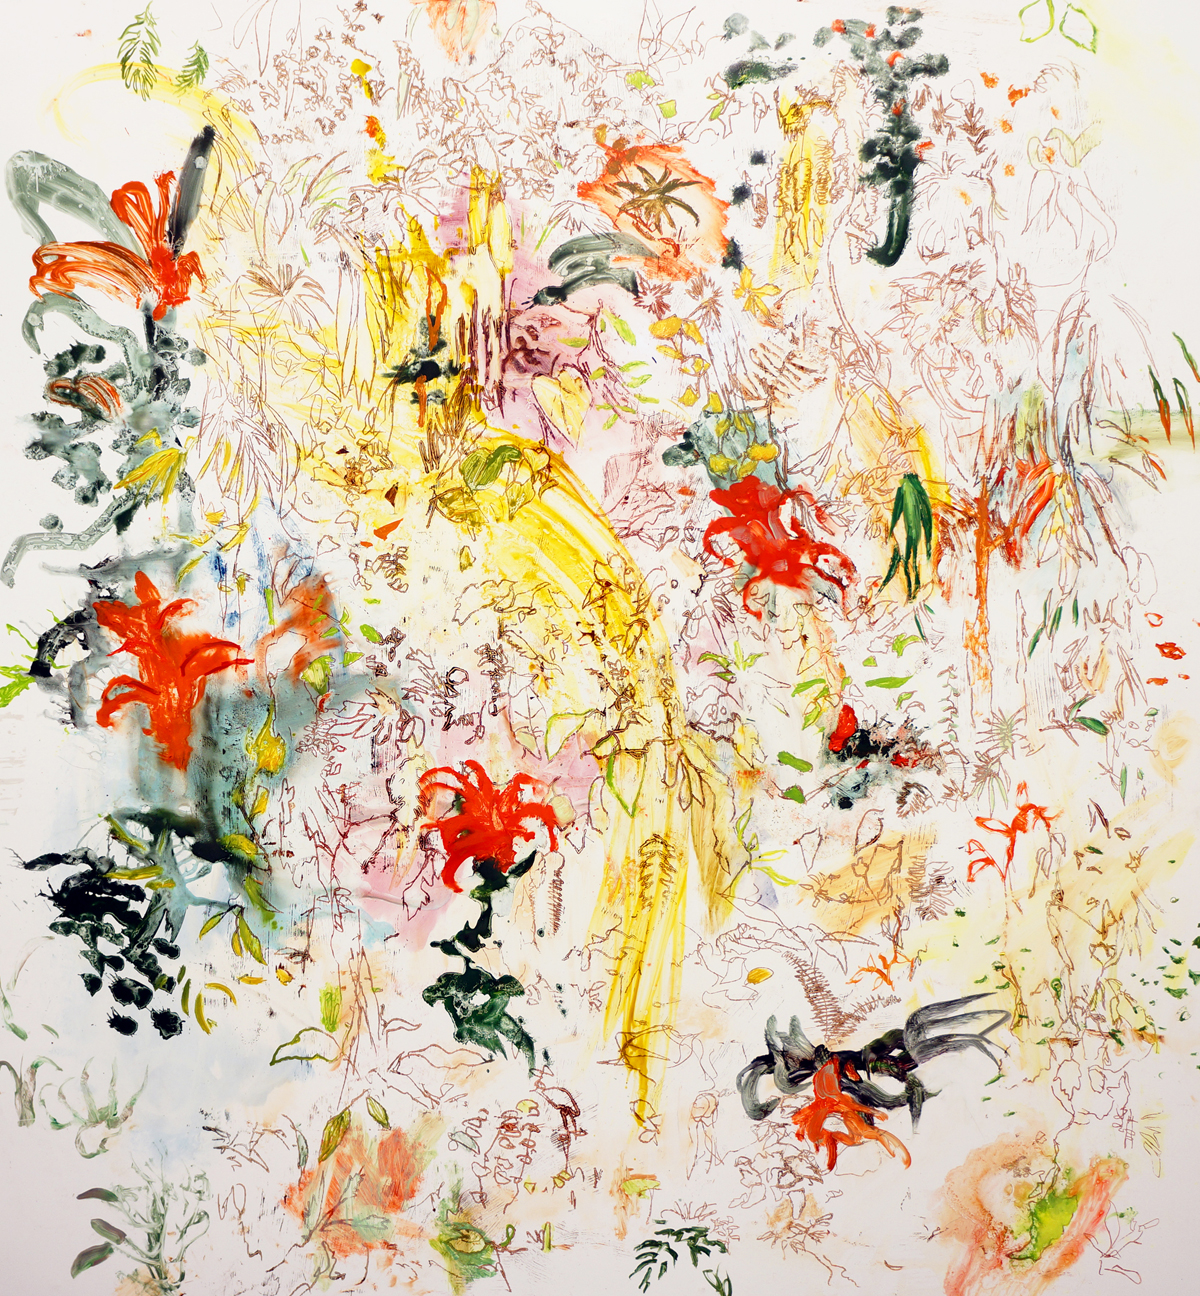 2016-floral1-John-DeFeo-48-x-44-botanic-painting-pattern-abstract-art.jpg